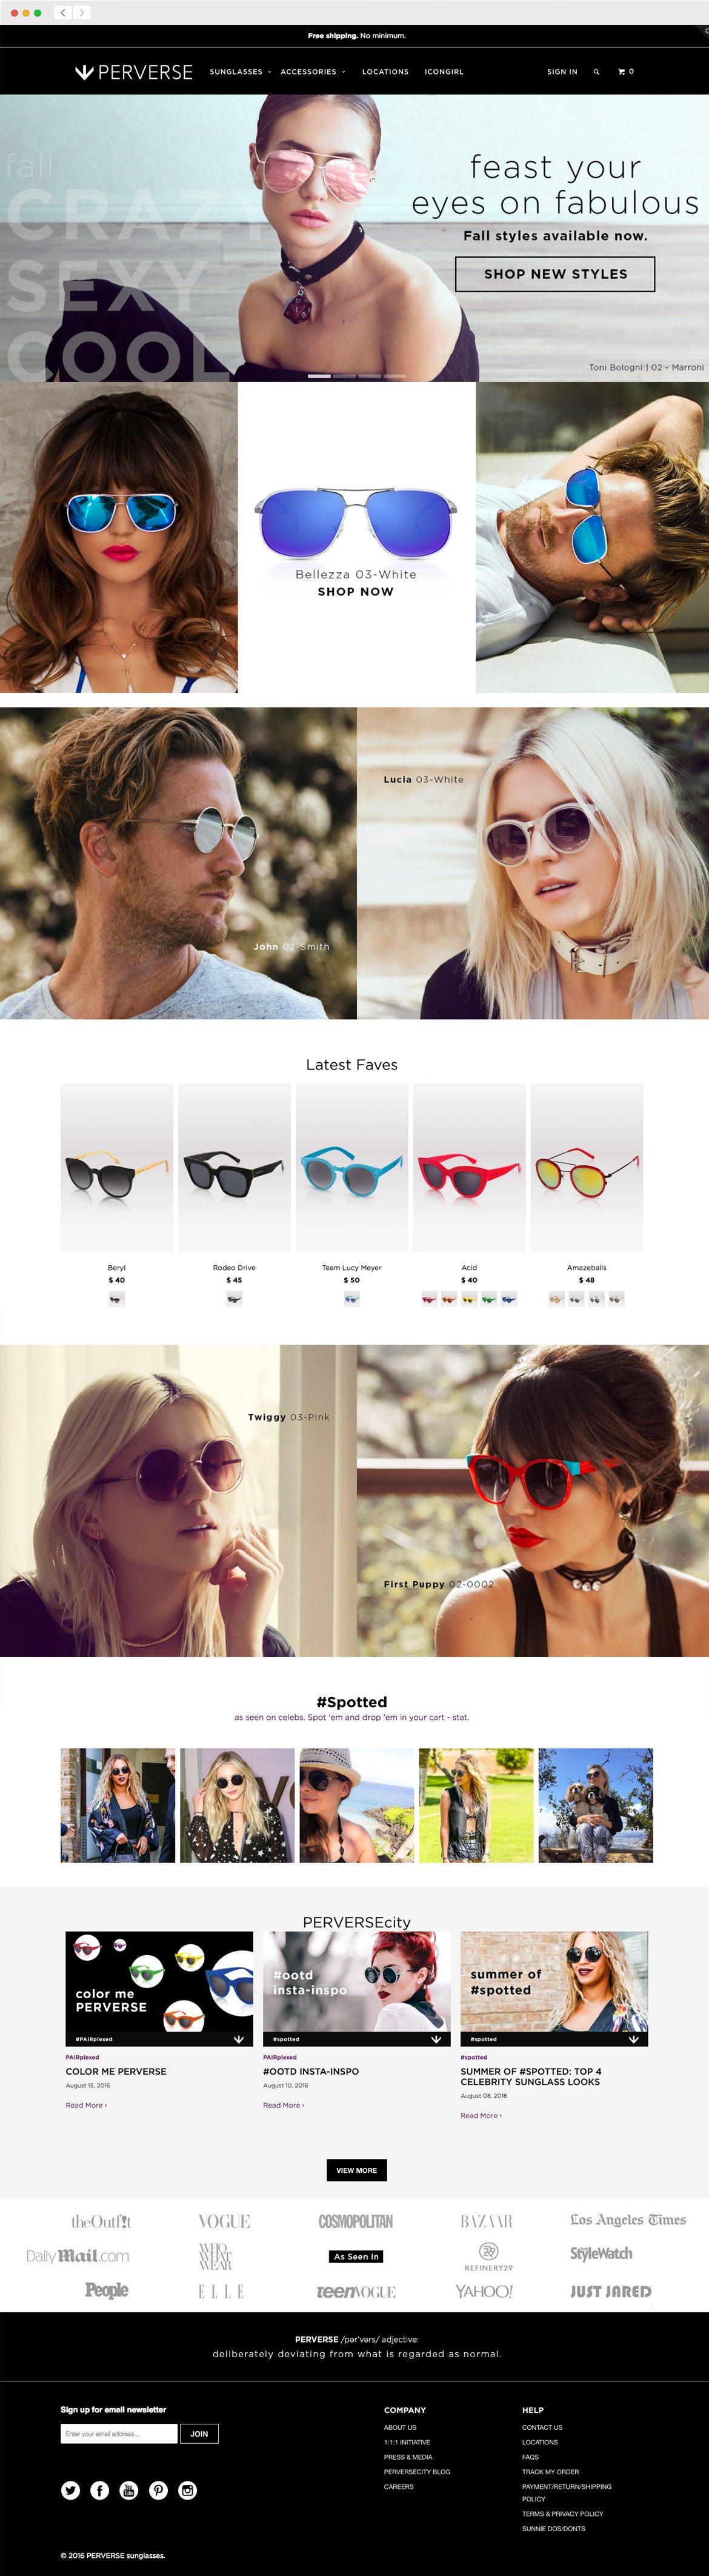 Perverse Sunglasses Web